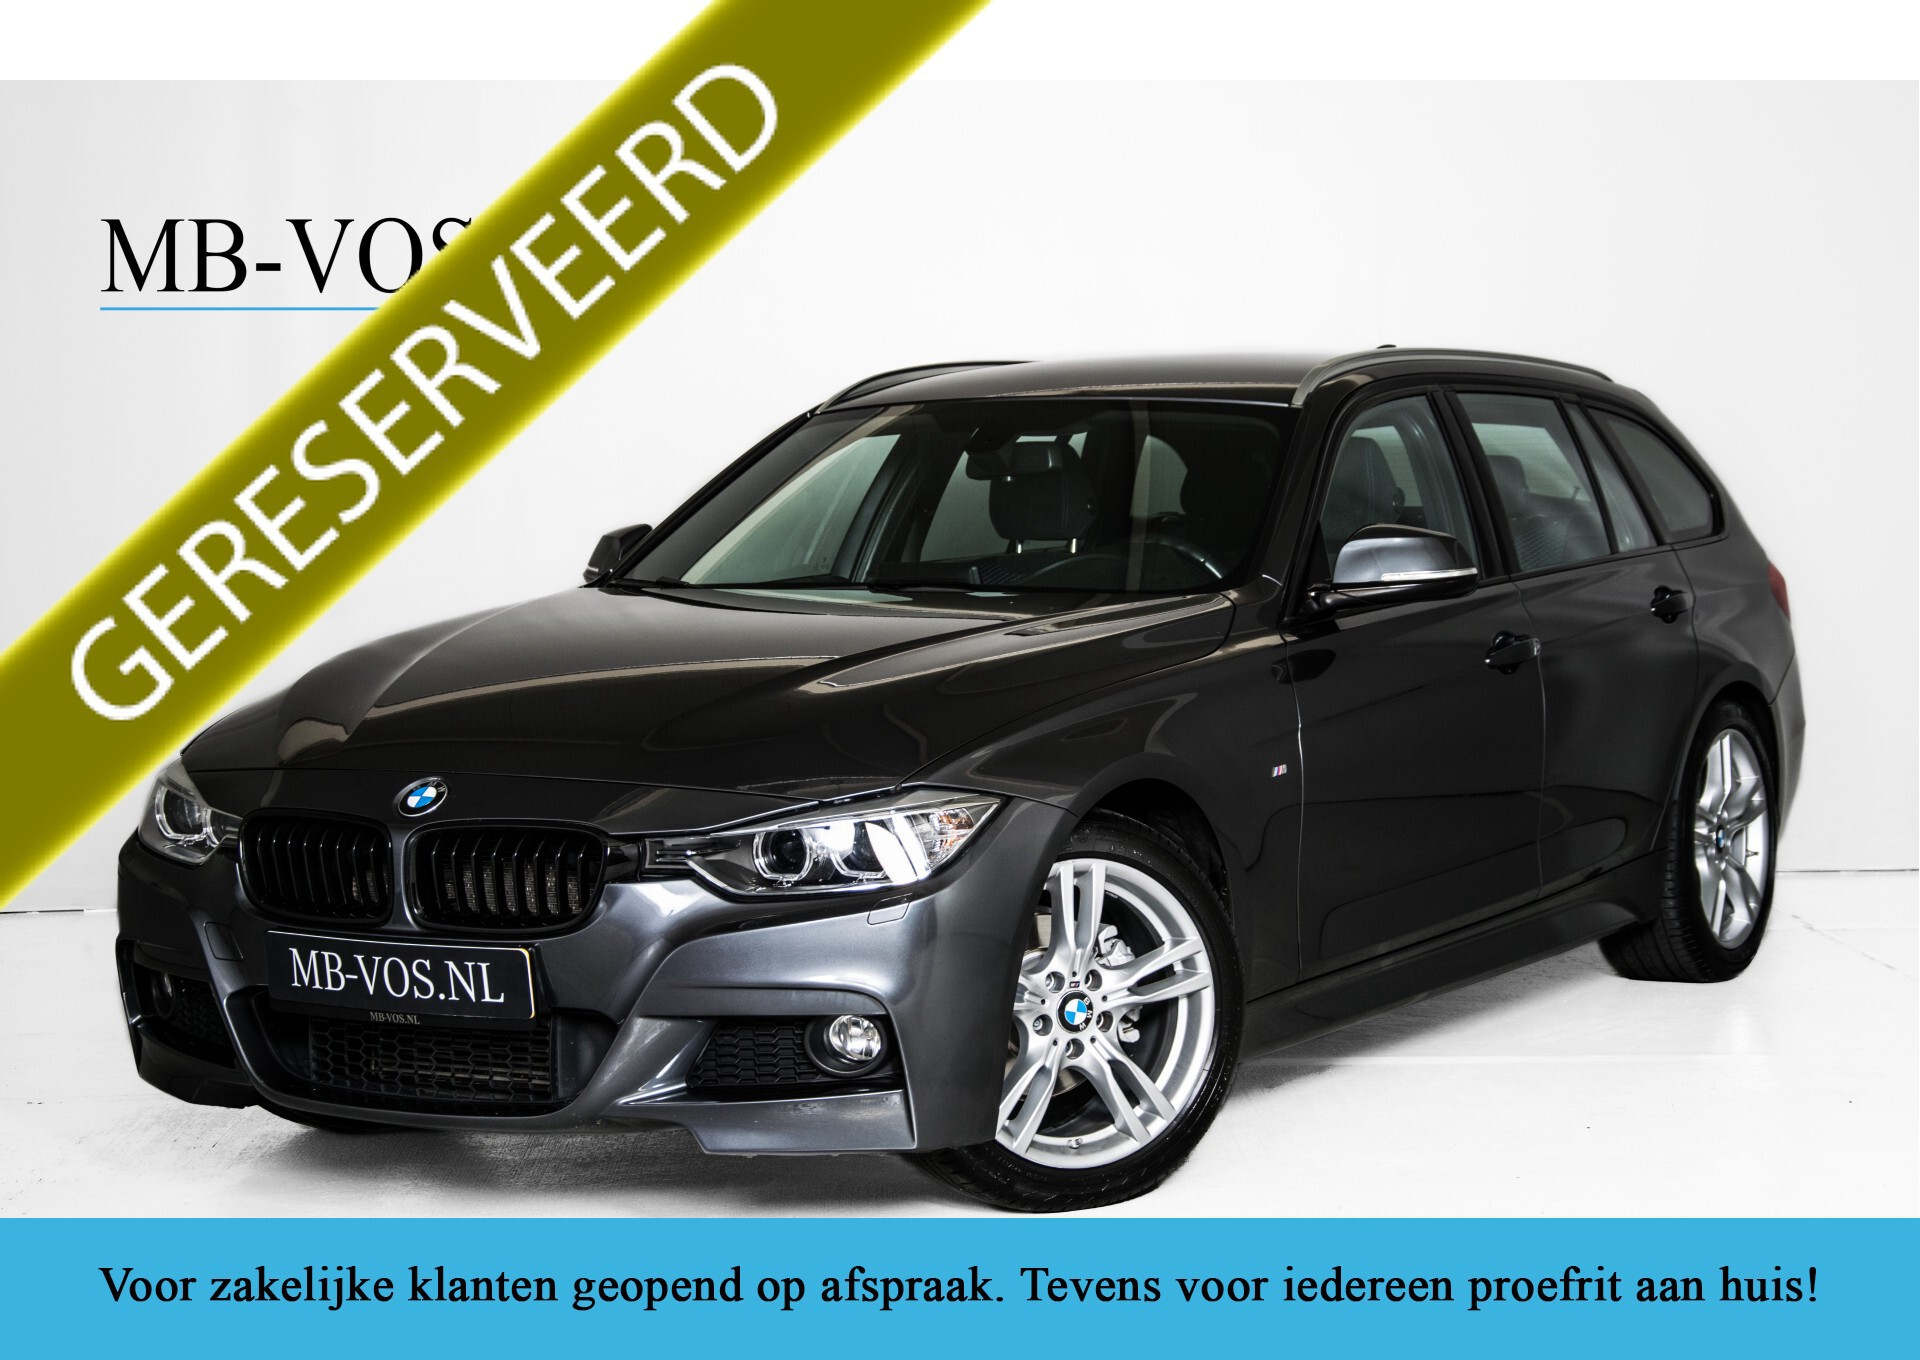 BMW 3 Serie Touring 316i M-Sportpakket Executive NL Auto/NAP Aut8 Foto 1